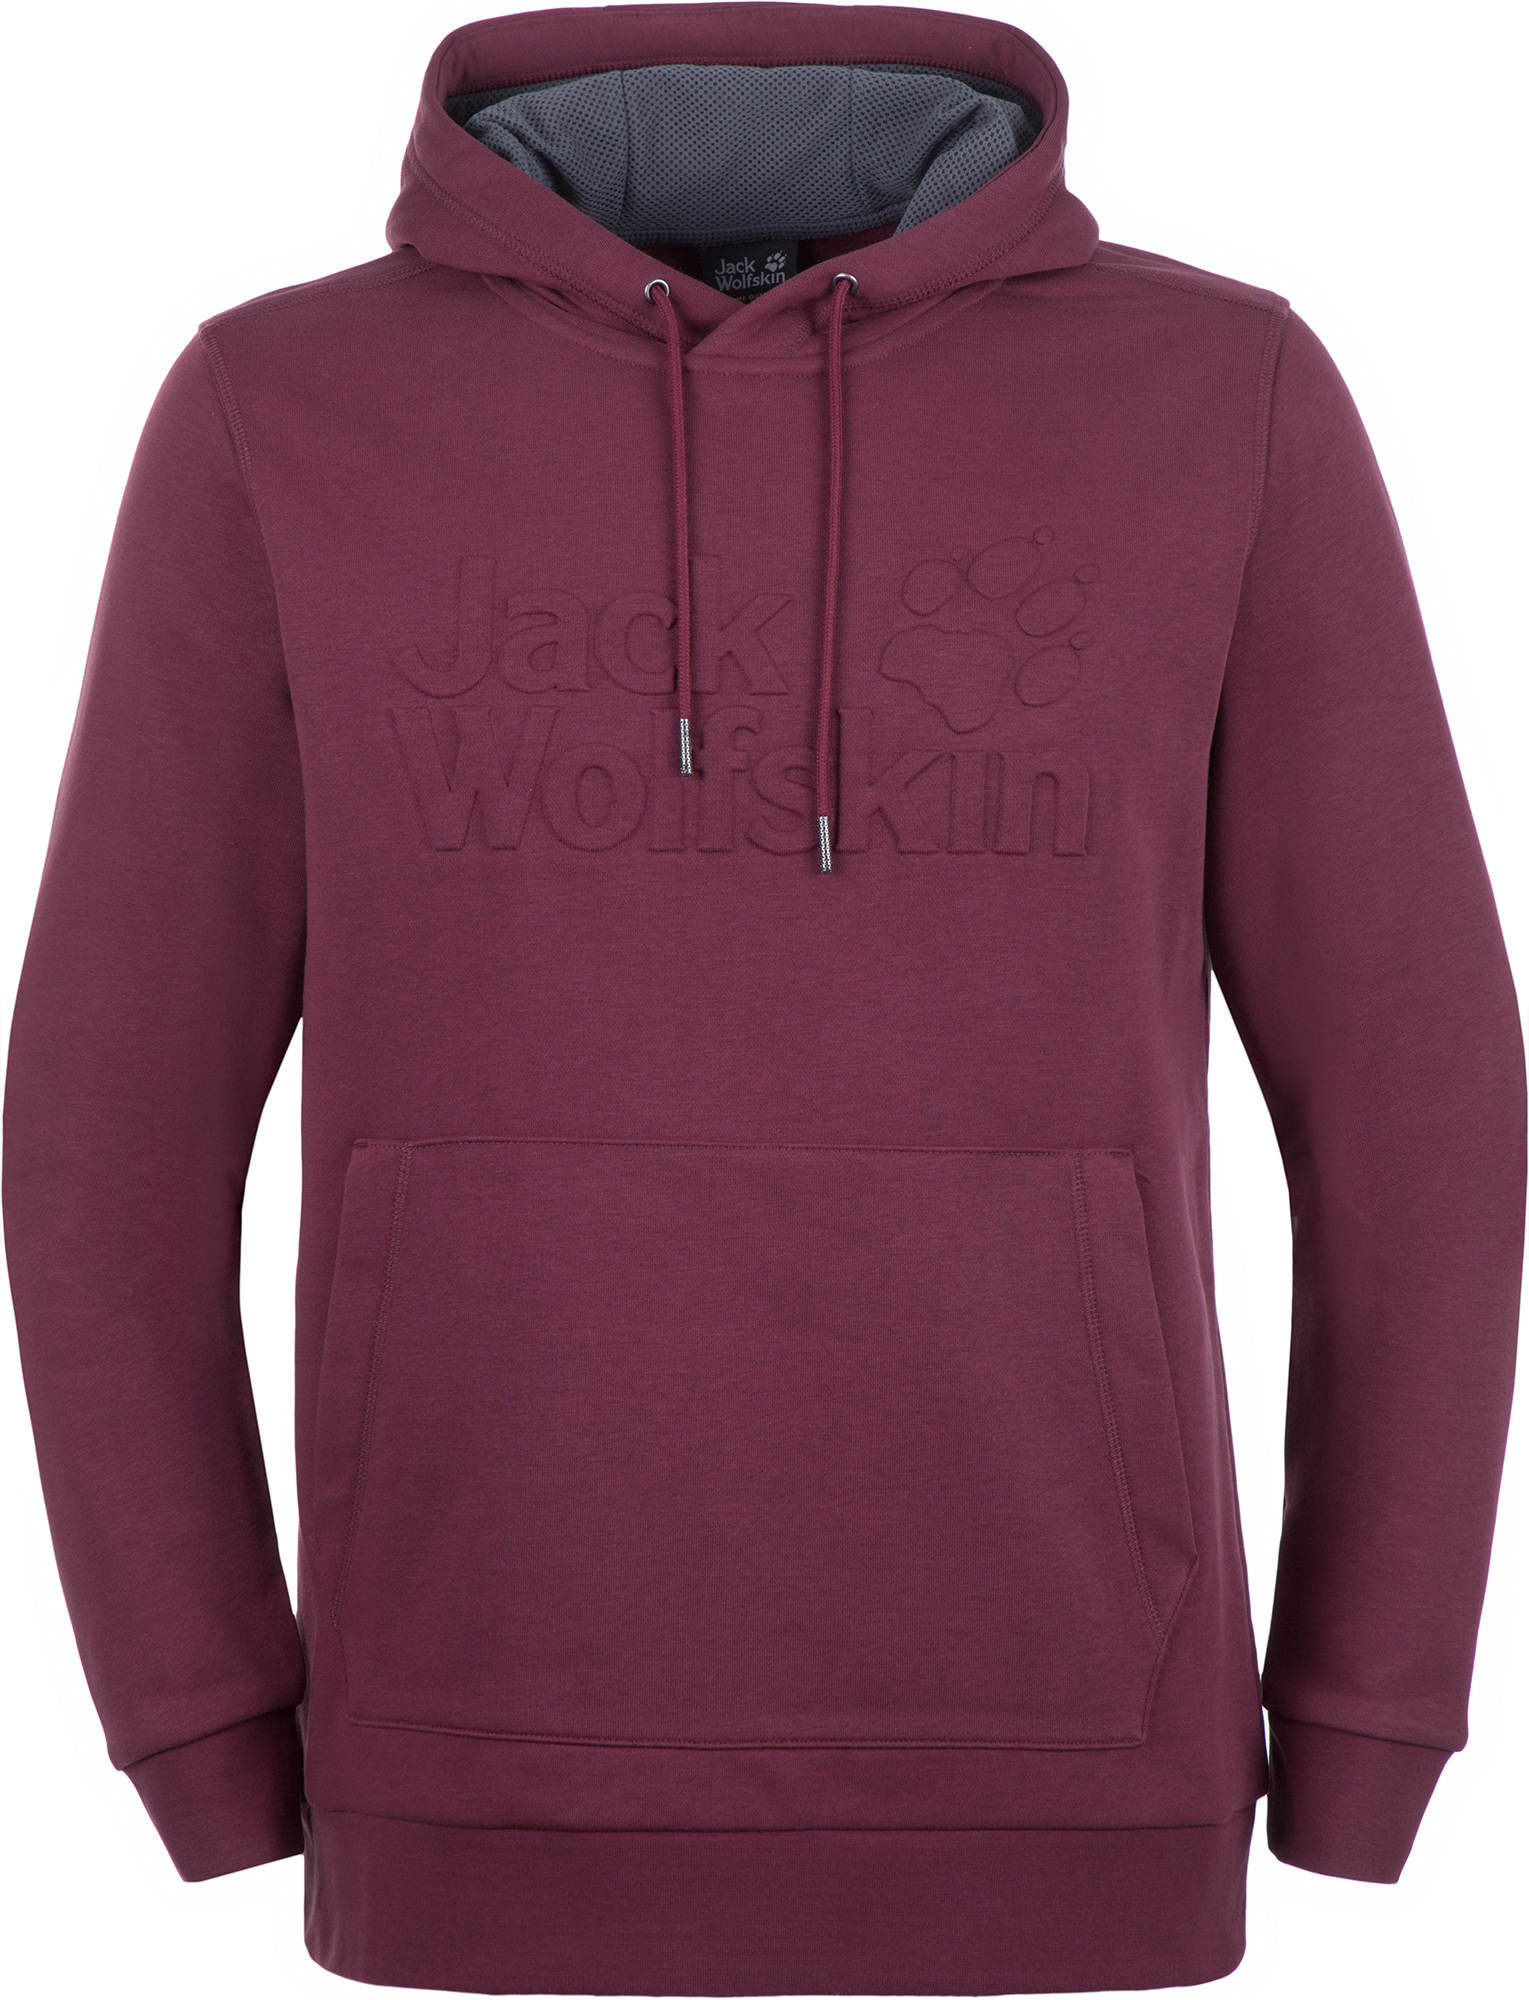 JACK WOLFSKIN Худи мужская Jack Wolfskin, размер 54-56 кепка jack wolfskin supplex canyon cap цвет молочный 1905891 5505 размер l 57 60